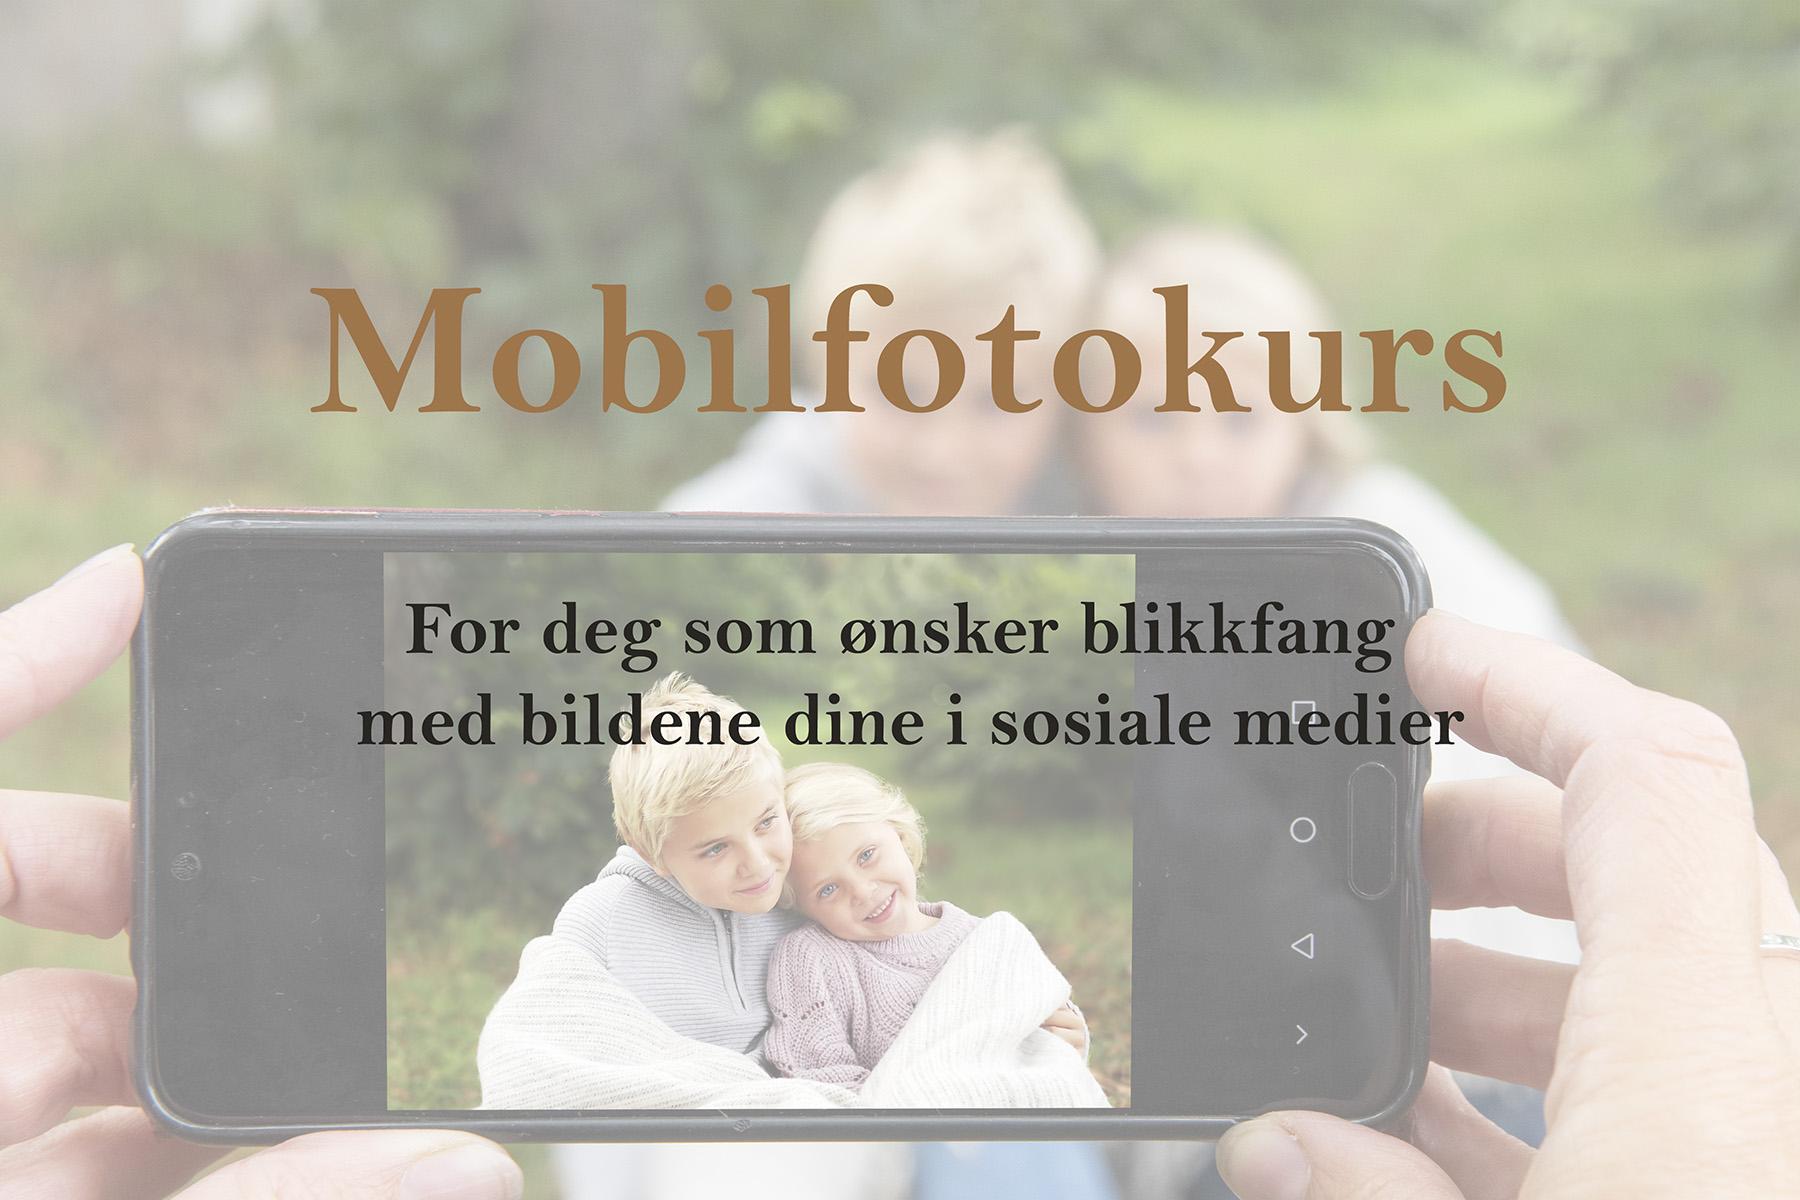 Bedre bilder fotokurs mobiltelefon